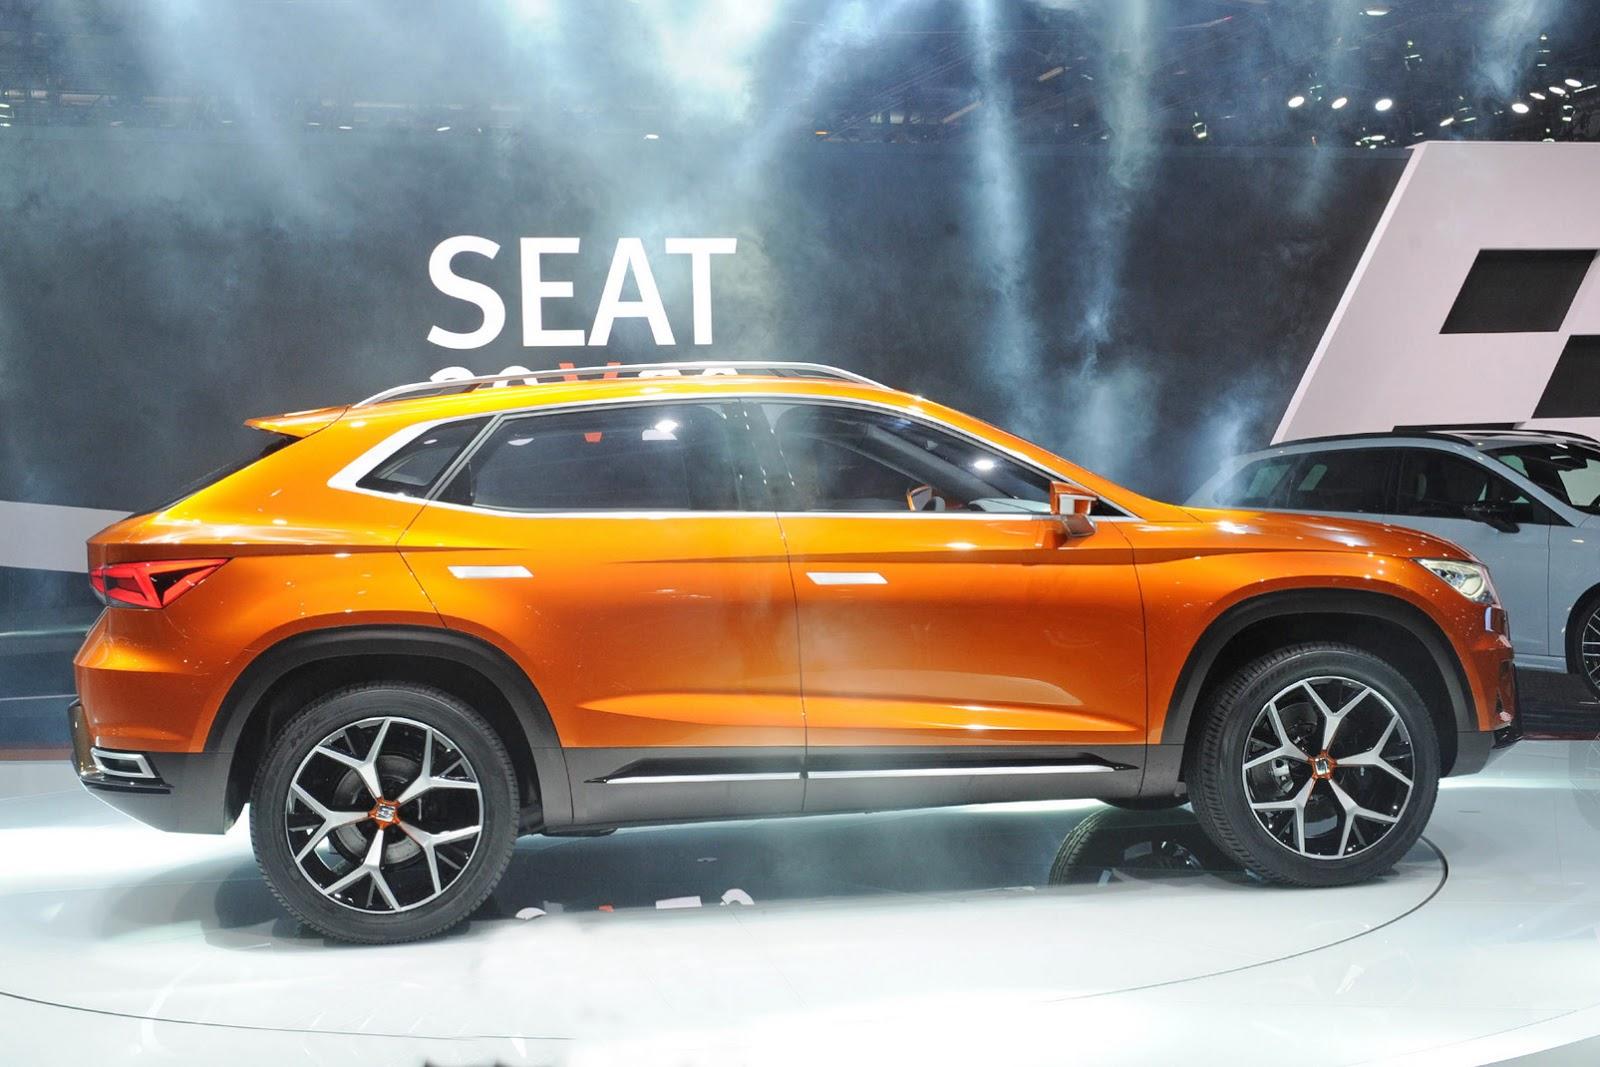 Seat-20v20-Concept-2 - AUTO BILD